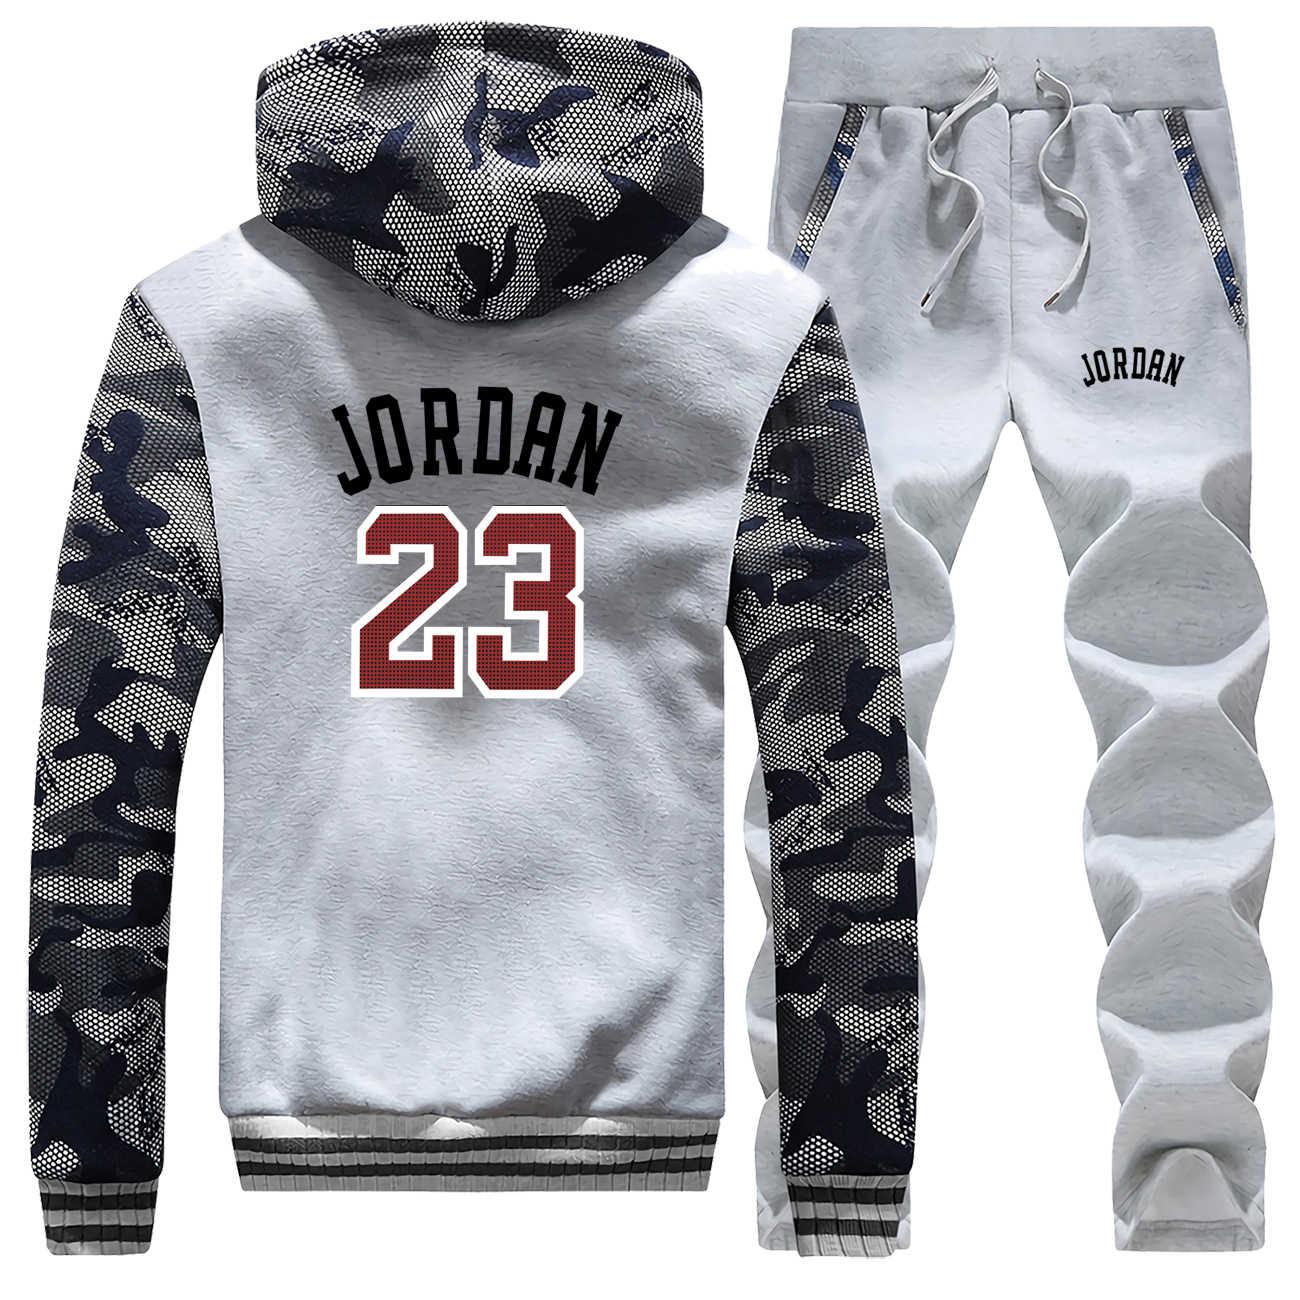 Jordan 23 Gedrukt Mens Jacket + Joggingbroek 2 Delige Set Mannen Hoodies Dikke Warme Rits Jassen Herfst Winter Nieuwe Trainingspak mannelijke Hoodie